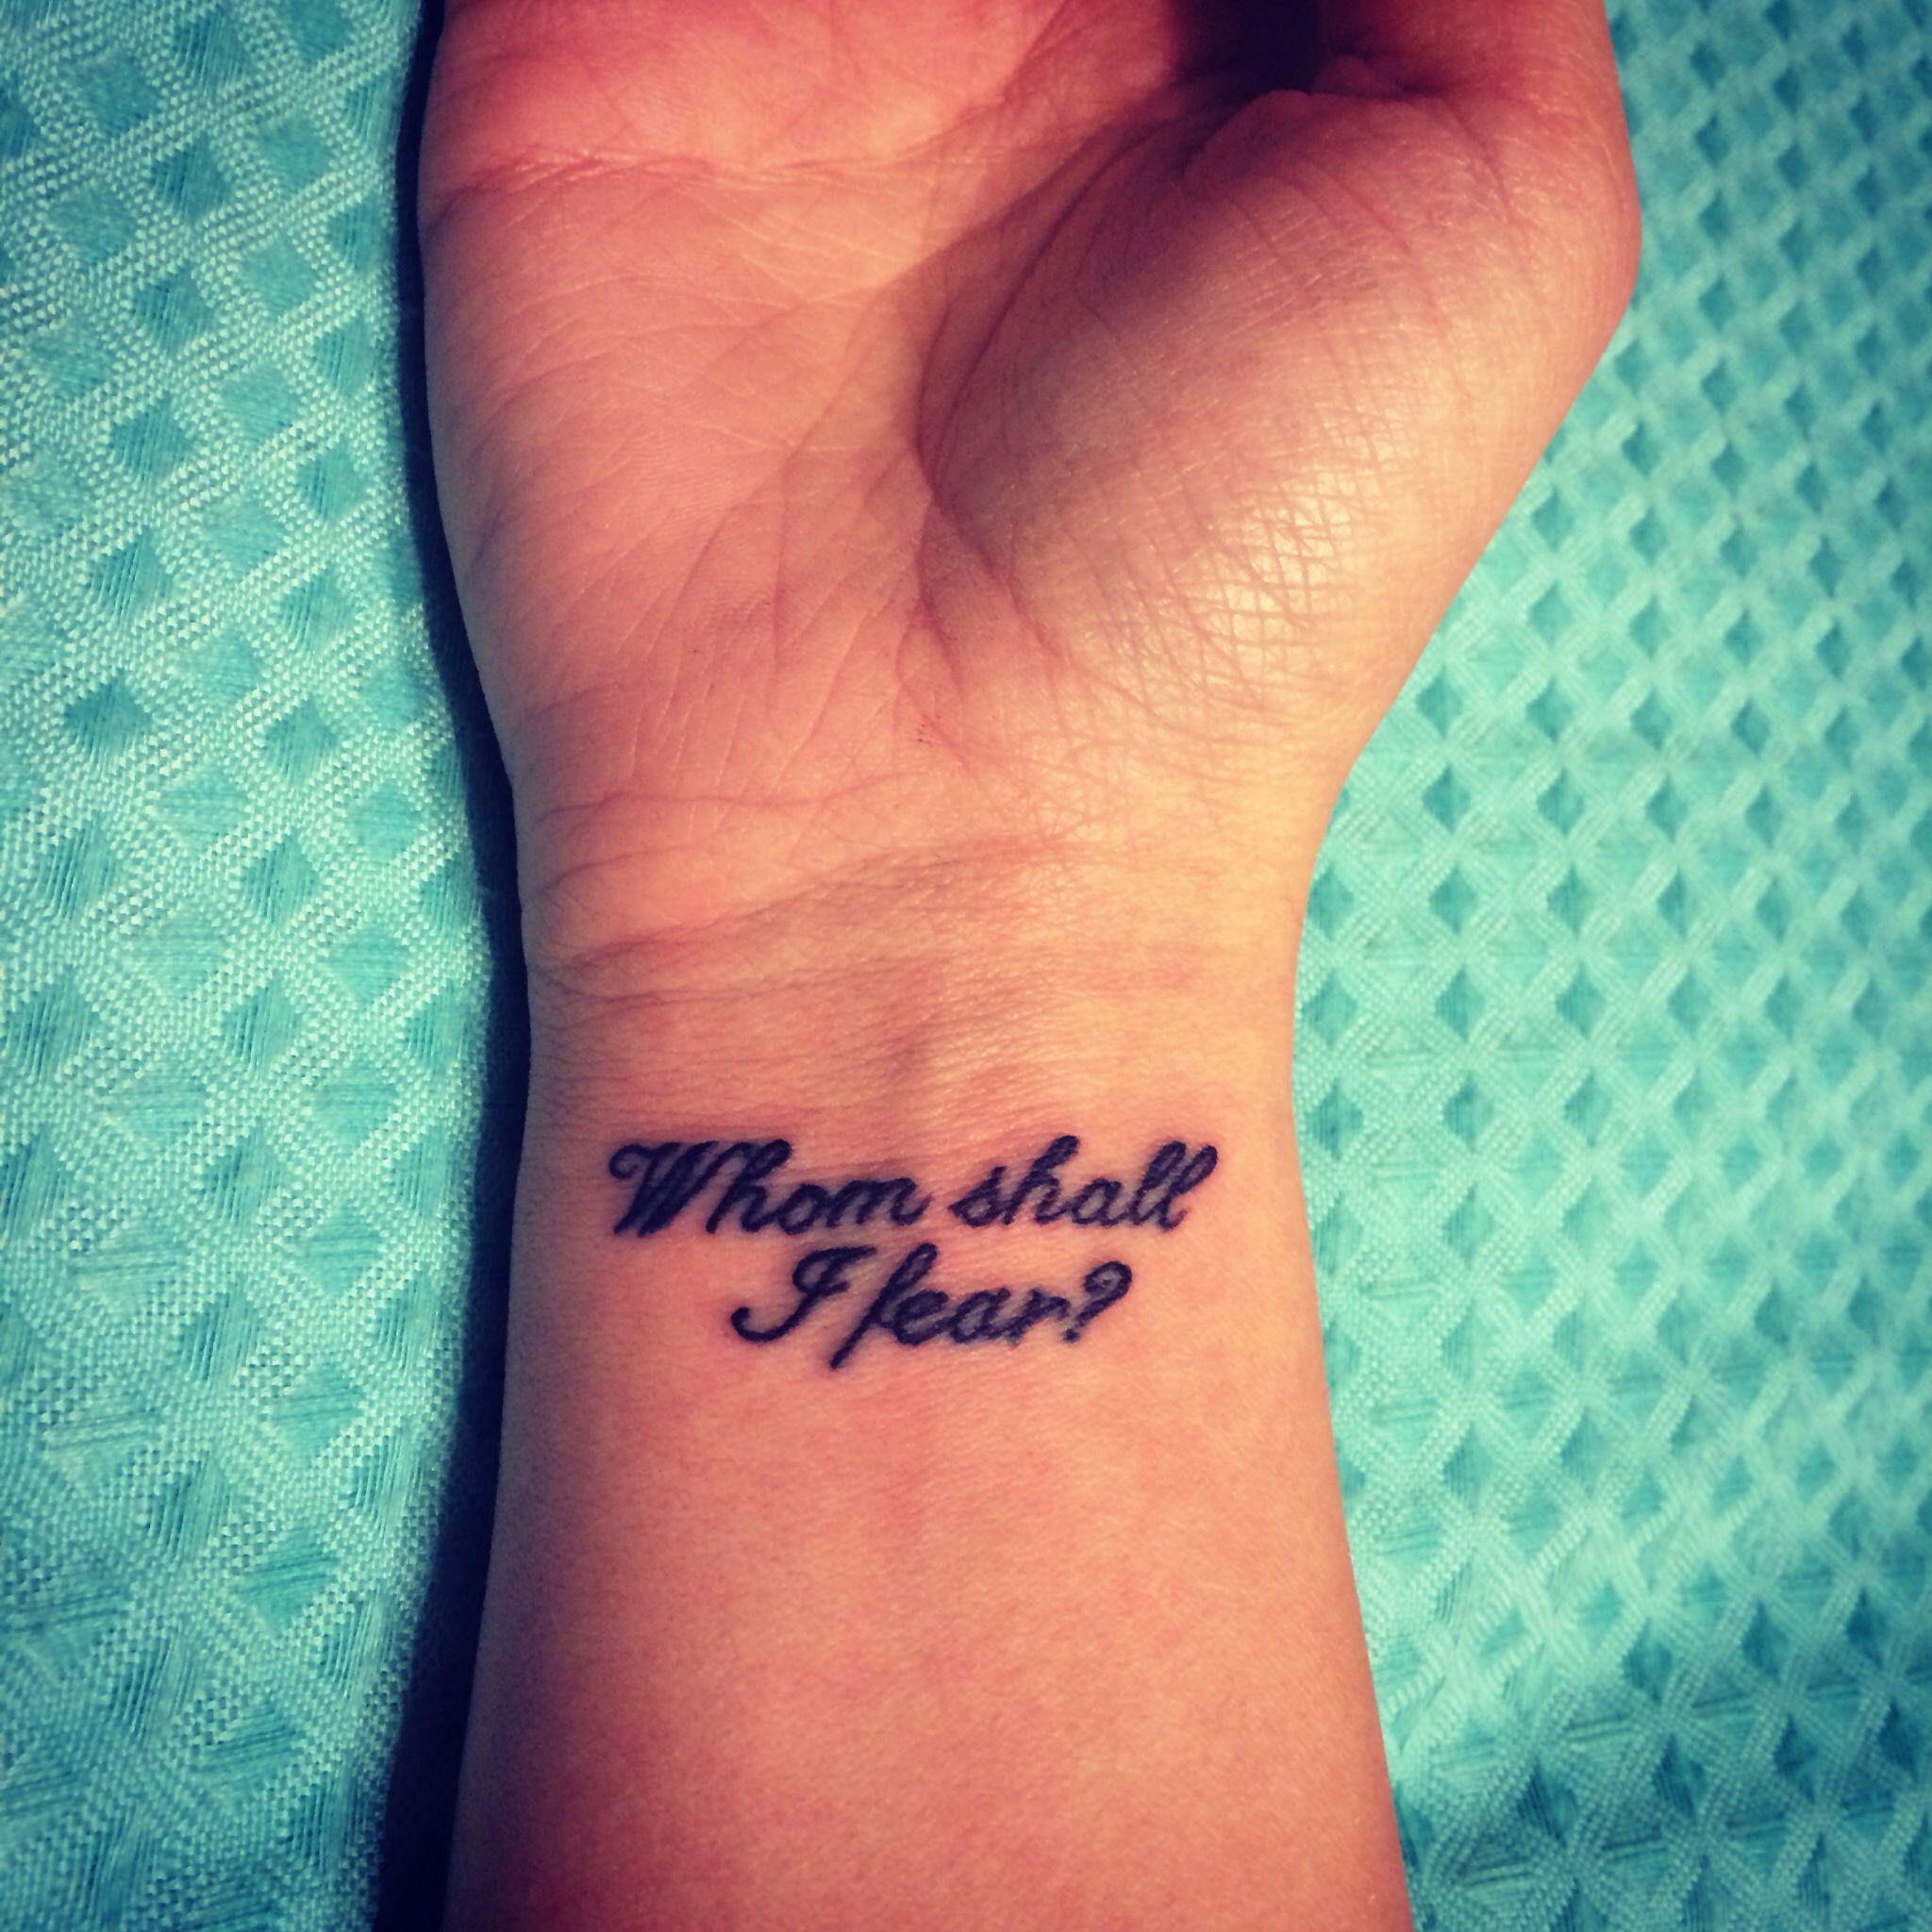 Psalm 23 Tattoo Designs Gallery Wwwcustom Web Designcouk